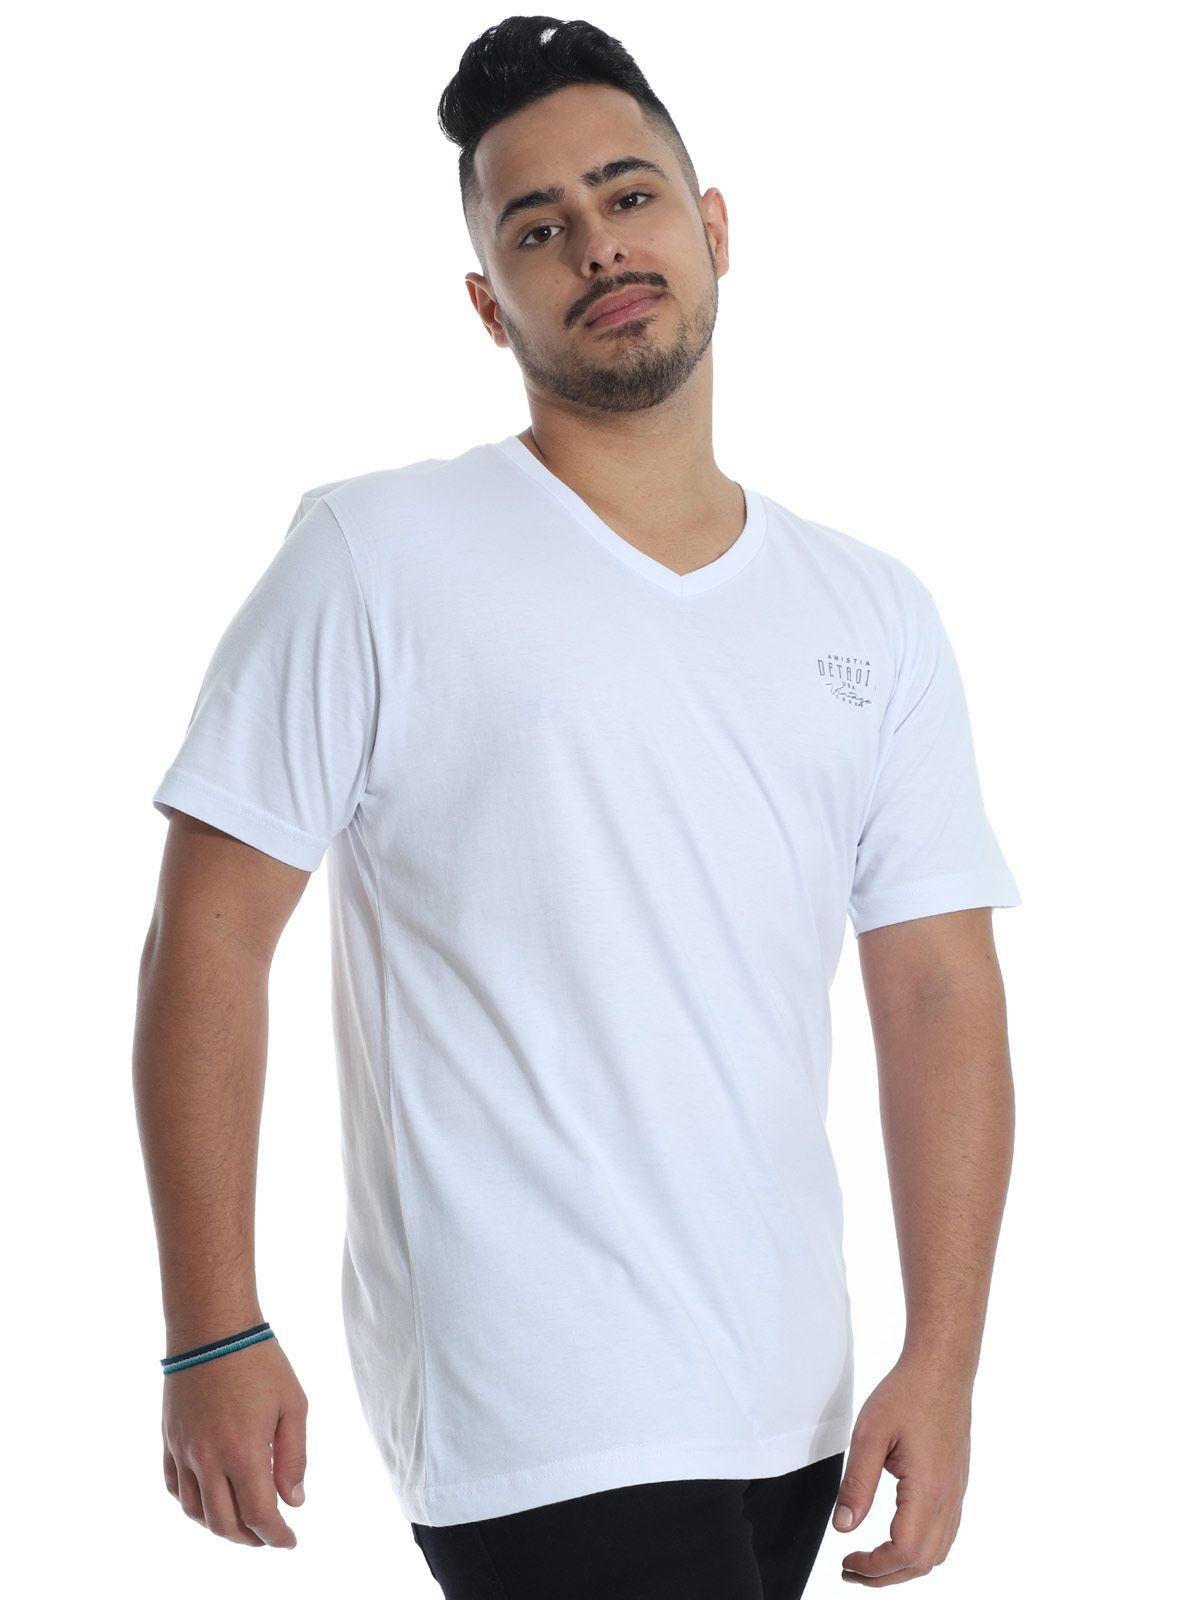 Camiseta Anistia Decote V. Vintage Branco